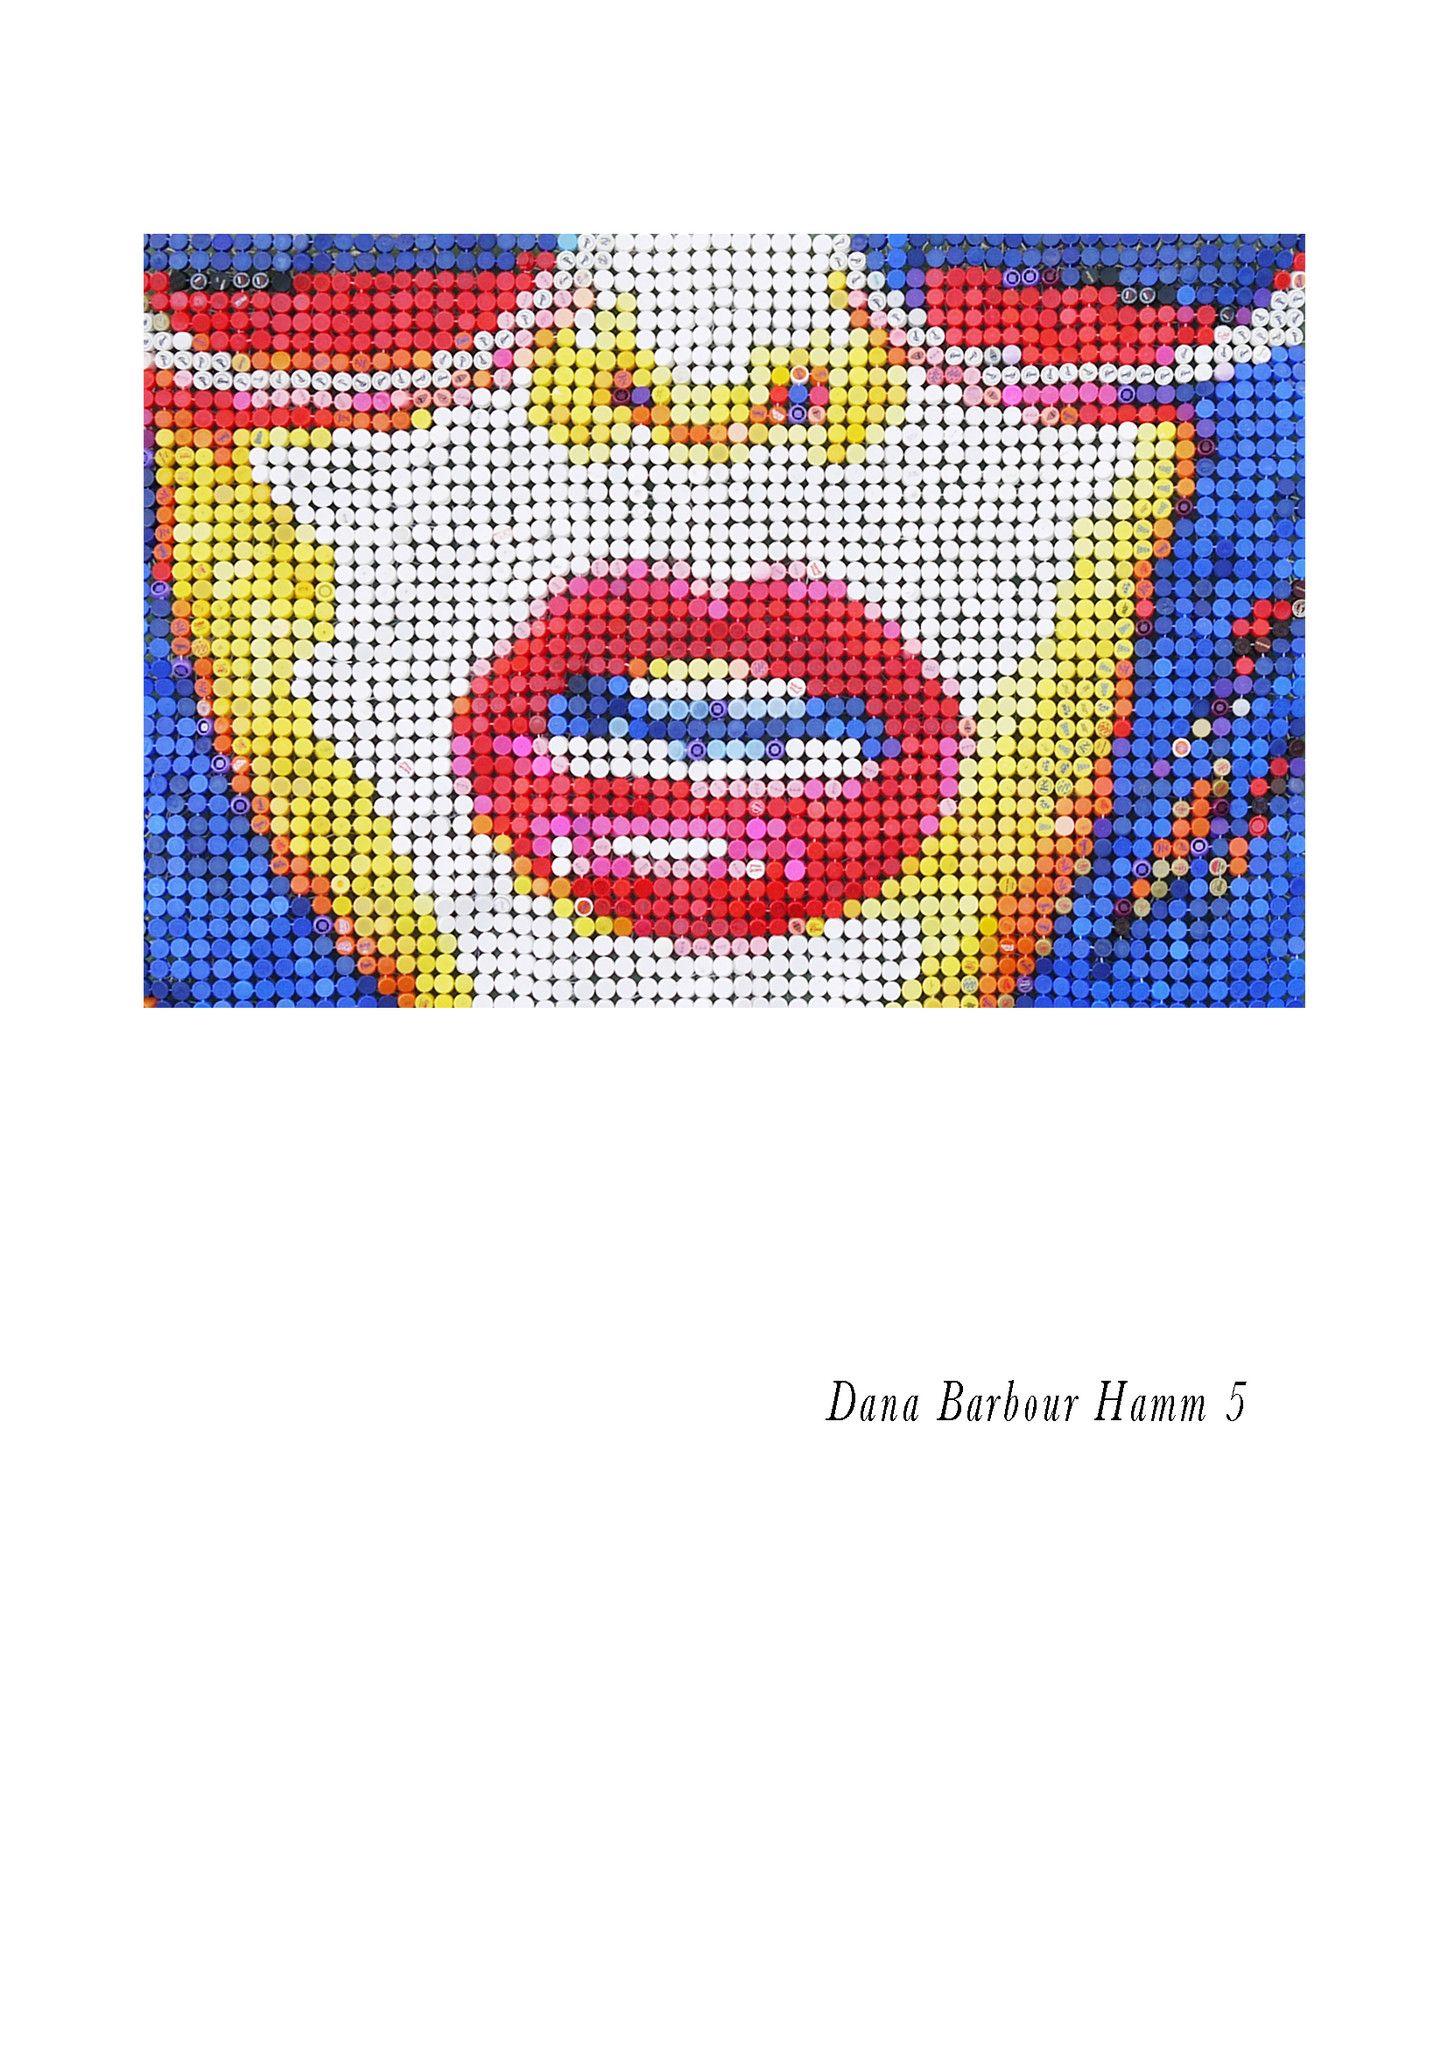 "MIXED MEDIA JORGE CASTRO GOMEZ  "" DANA 5 ""  dimensioni L 180 x H 120 cm."